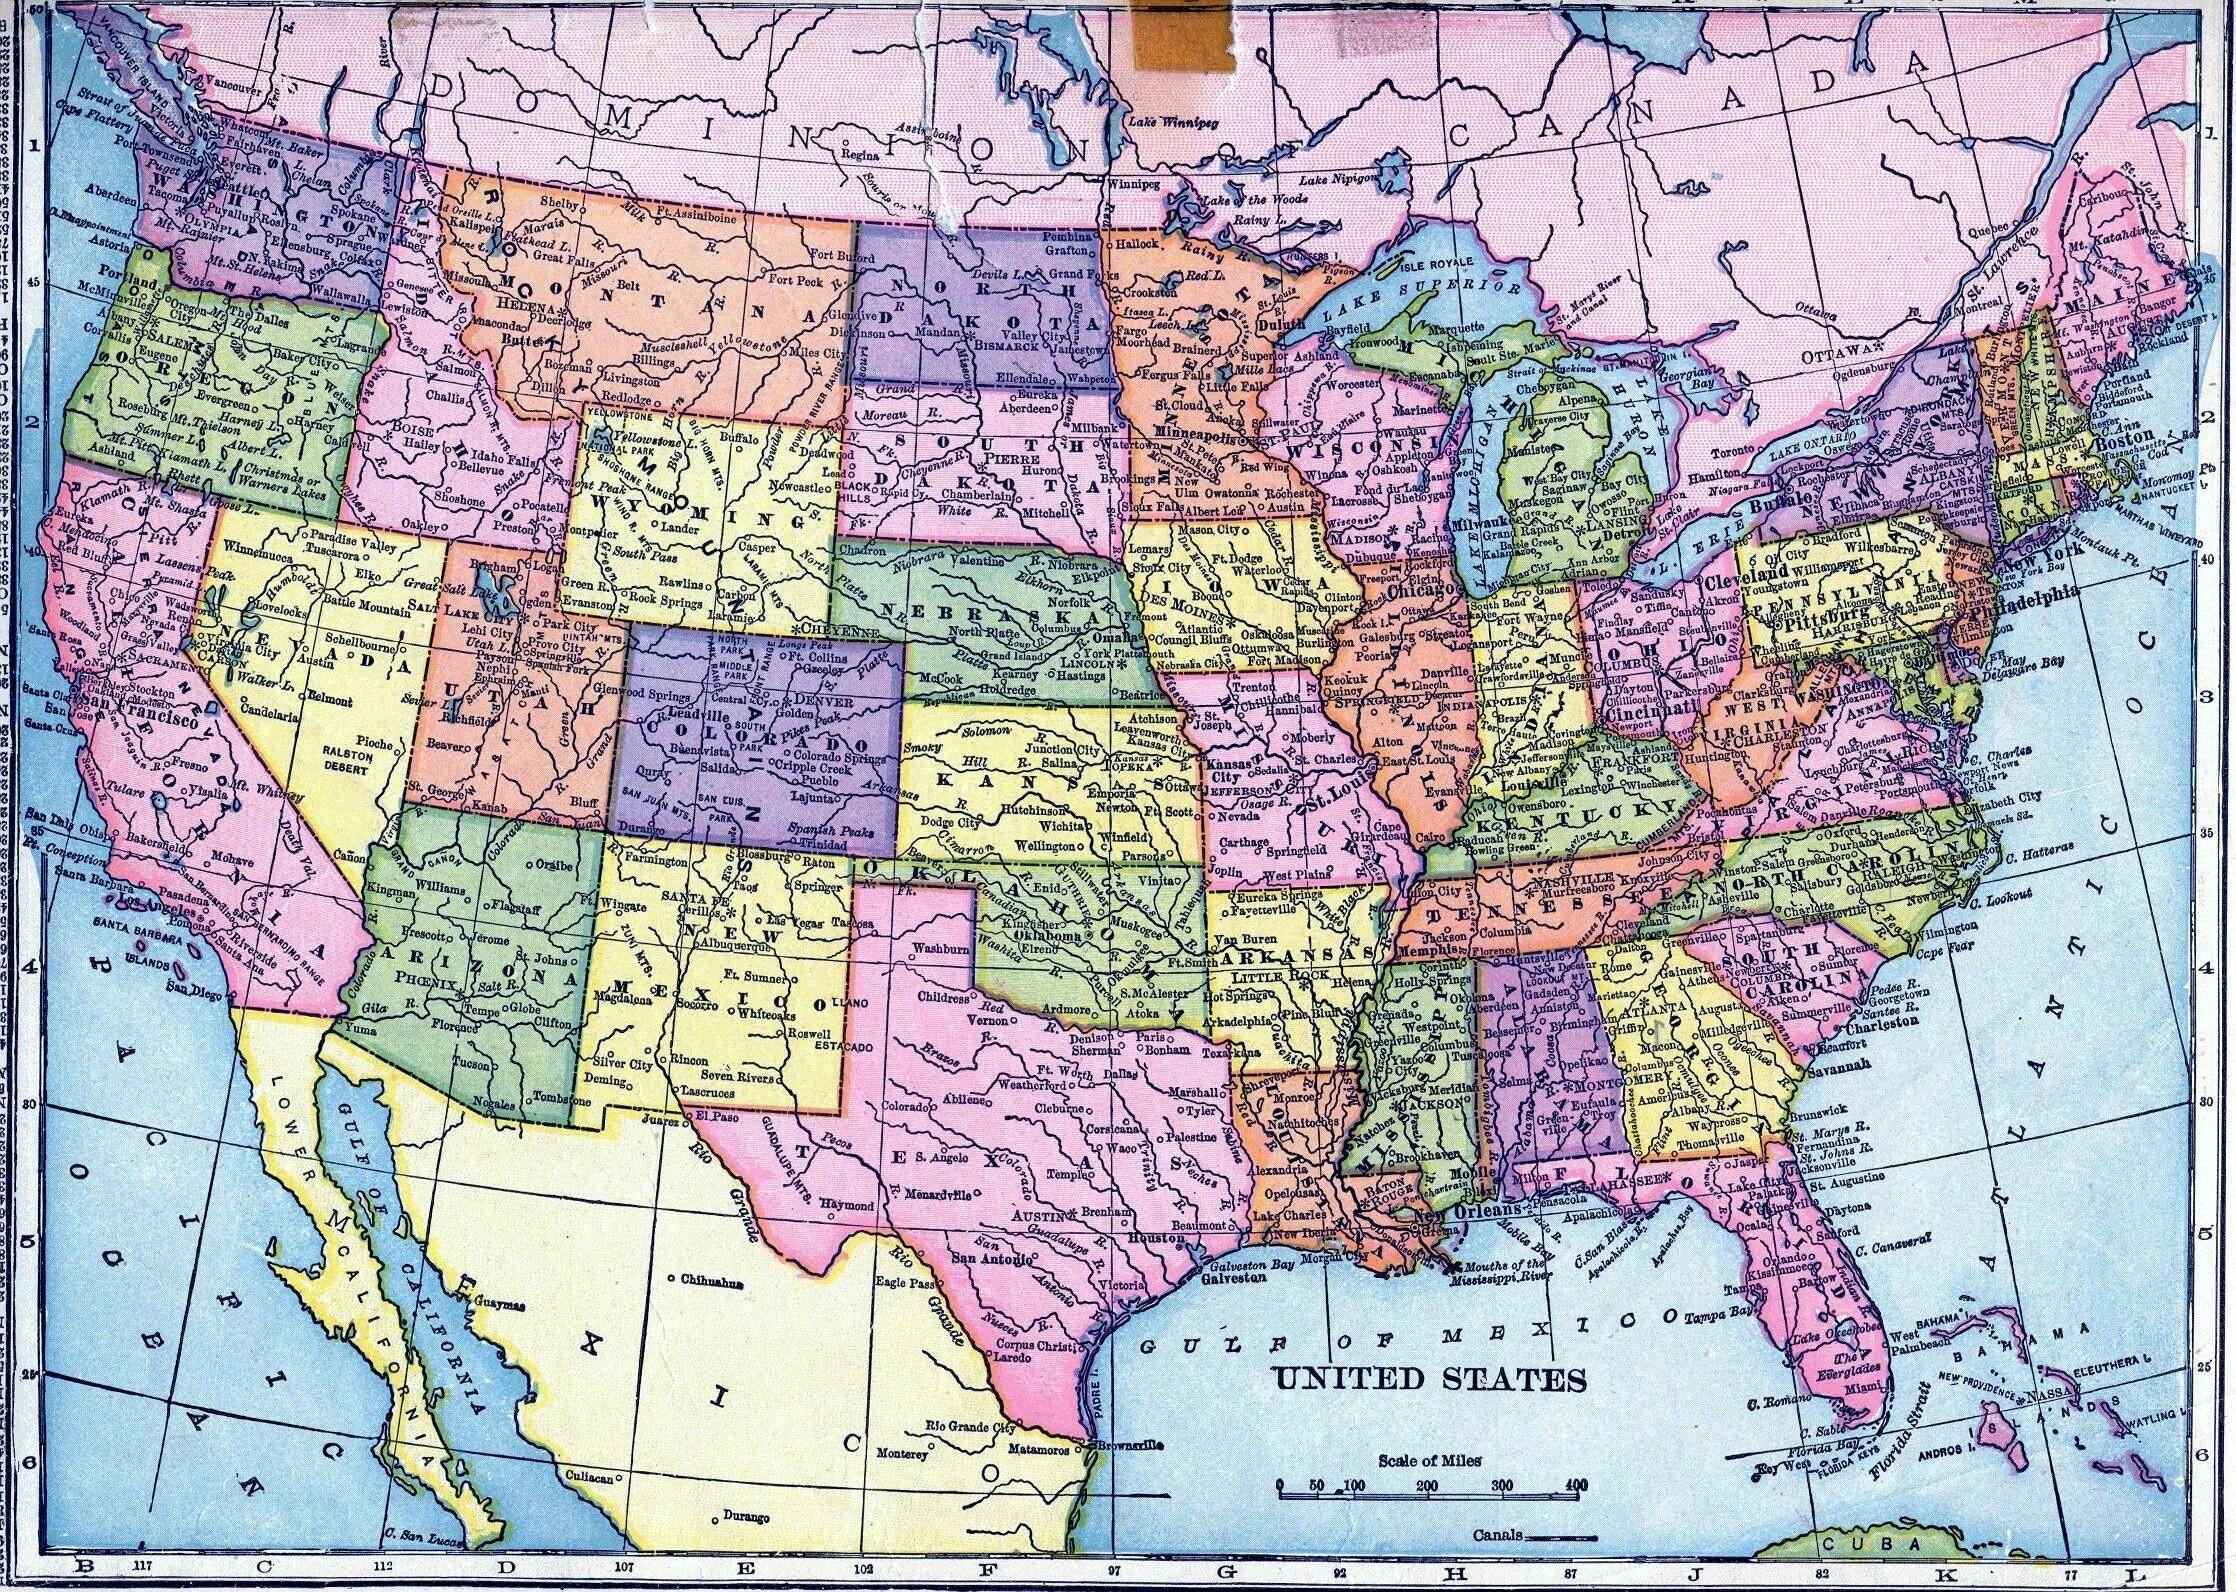 Detailed Map Of California Coast Printable Maps Driving Map Us East - Printable Driving Maps